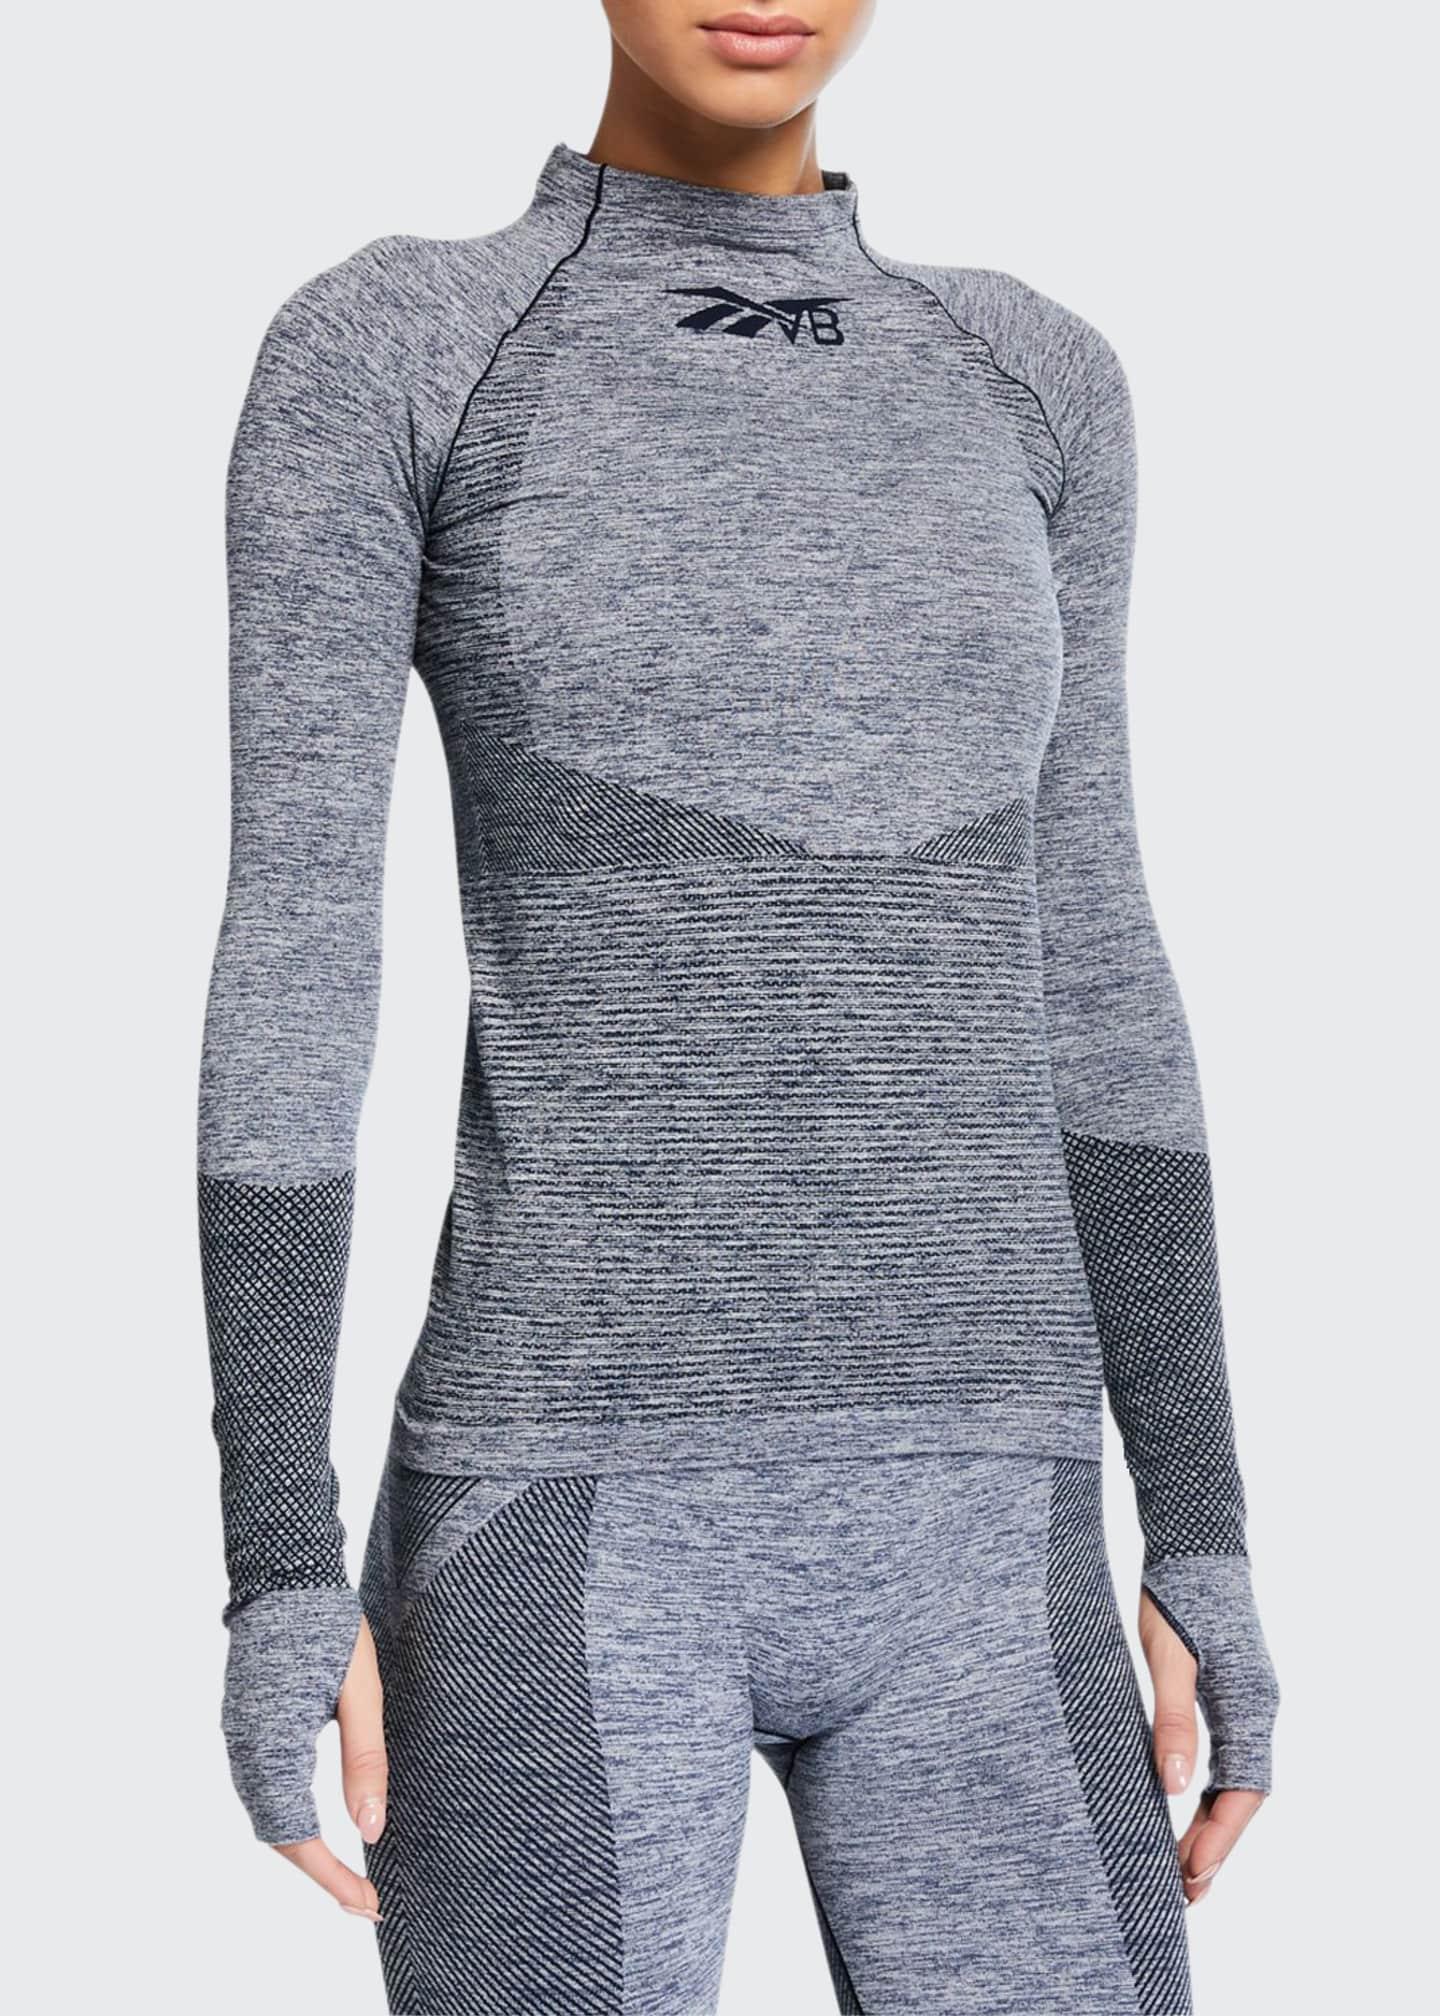 Reebok by Victoria Beckham Seamless Long-Sleeve Textured Active